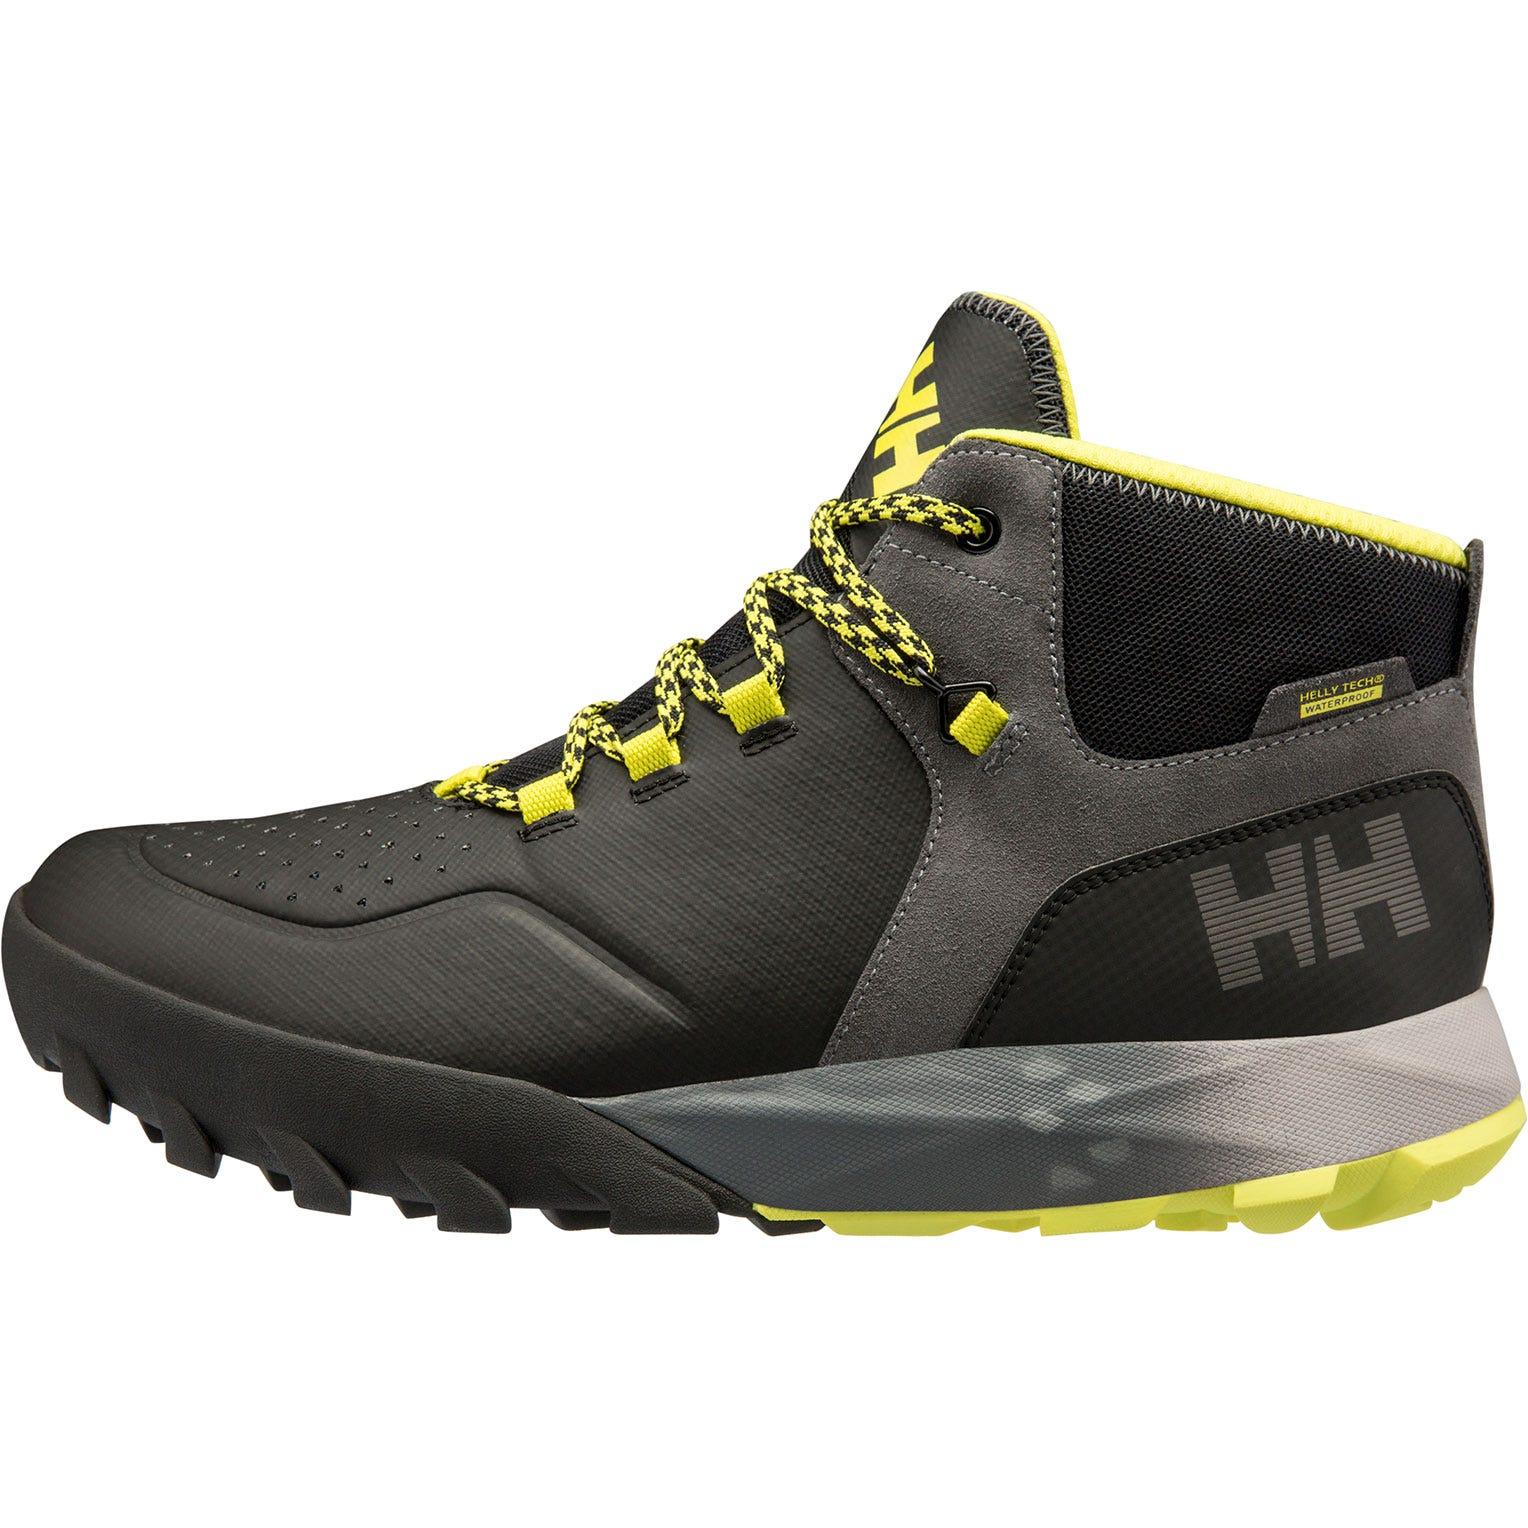 Helly Hansen Loke Rambler Ht Mens Hiking Boot Black 45/11